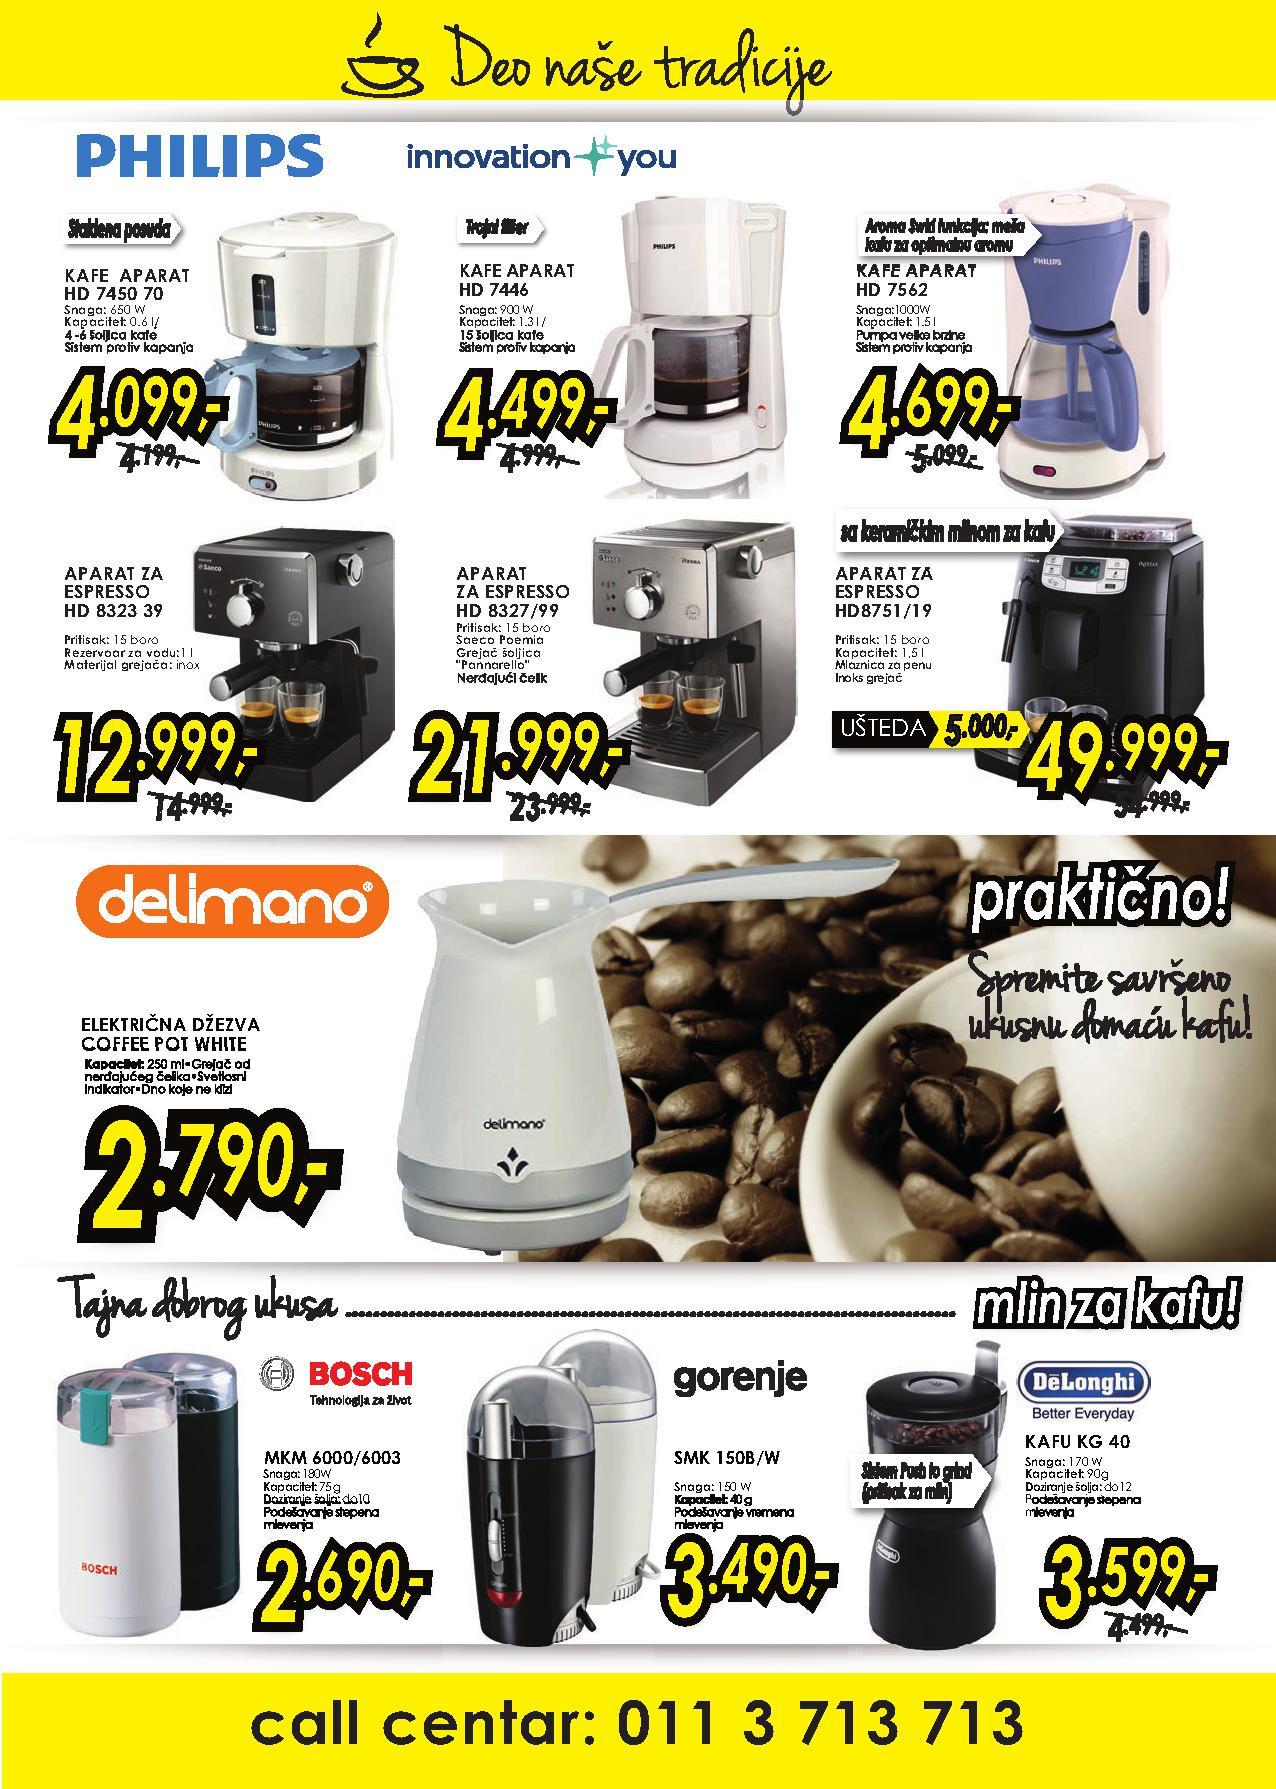 Tehnomanija akcija kafe aparata